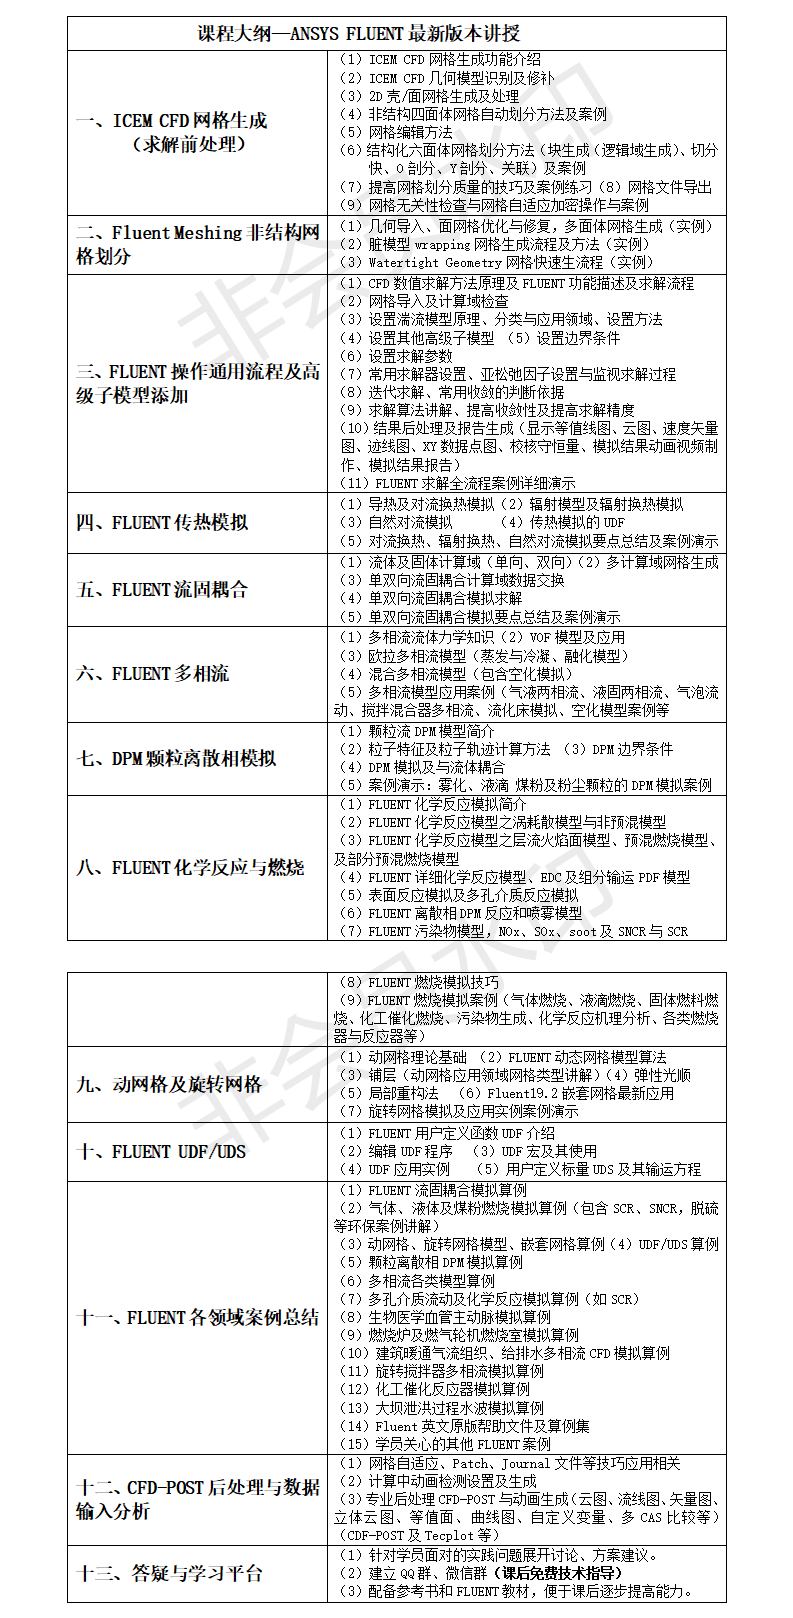 2019ANSYS FLUENT通用流体模拟核心技术应用与案例实战培训班(10月北京班)